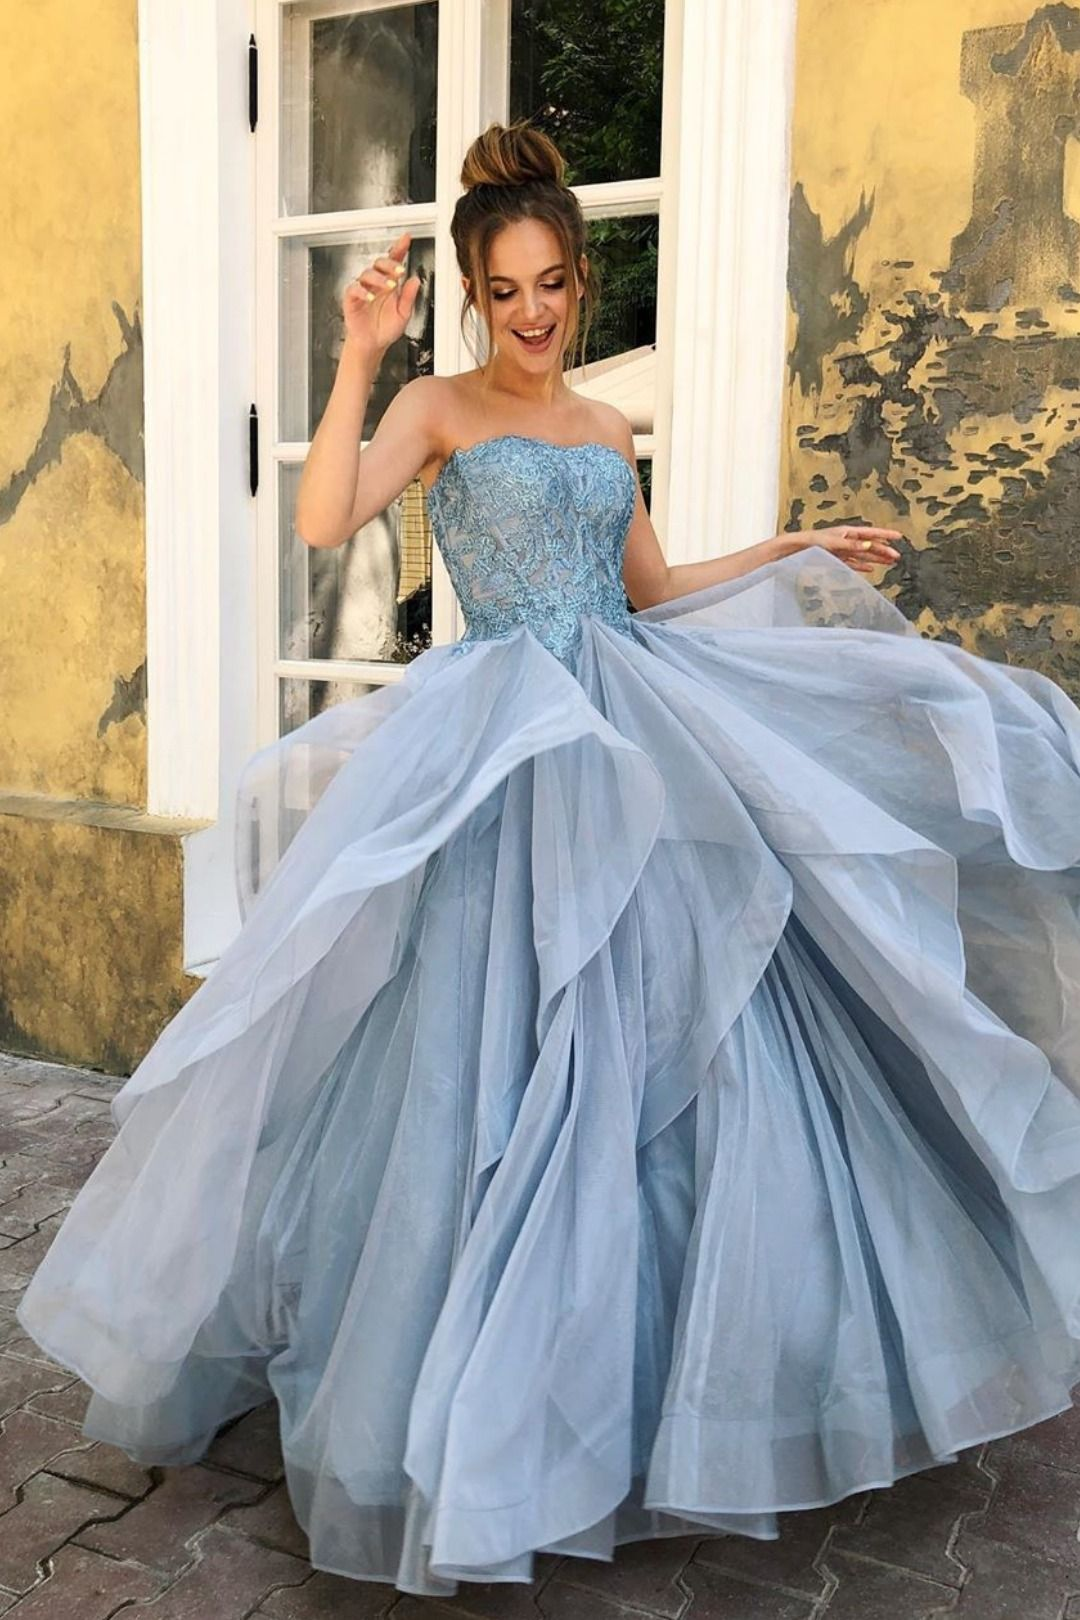 2020 Long Prom Dresses, Strapless Blue Prom Dresses